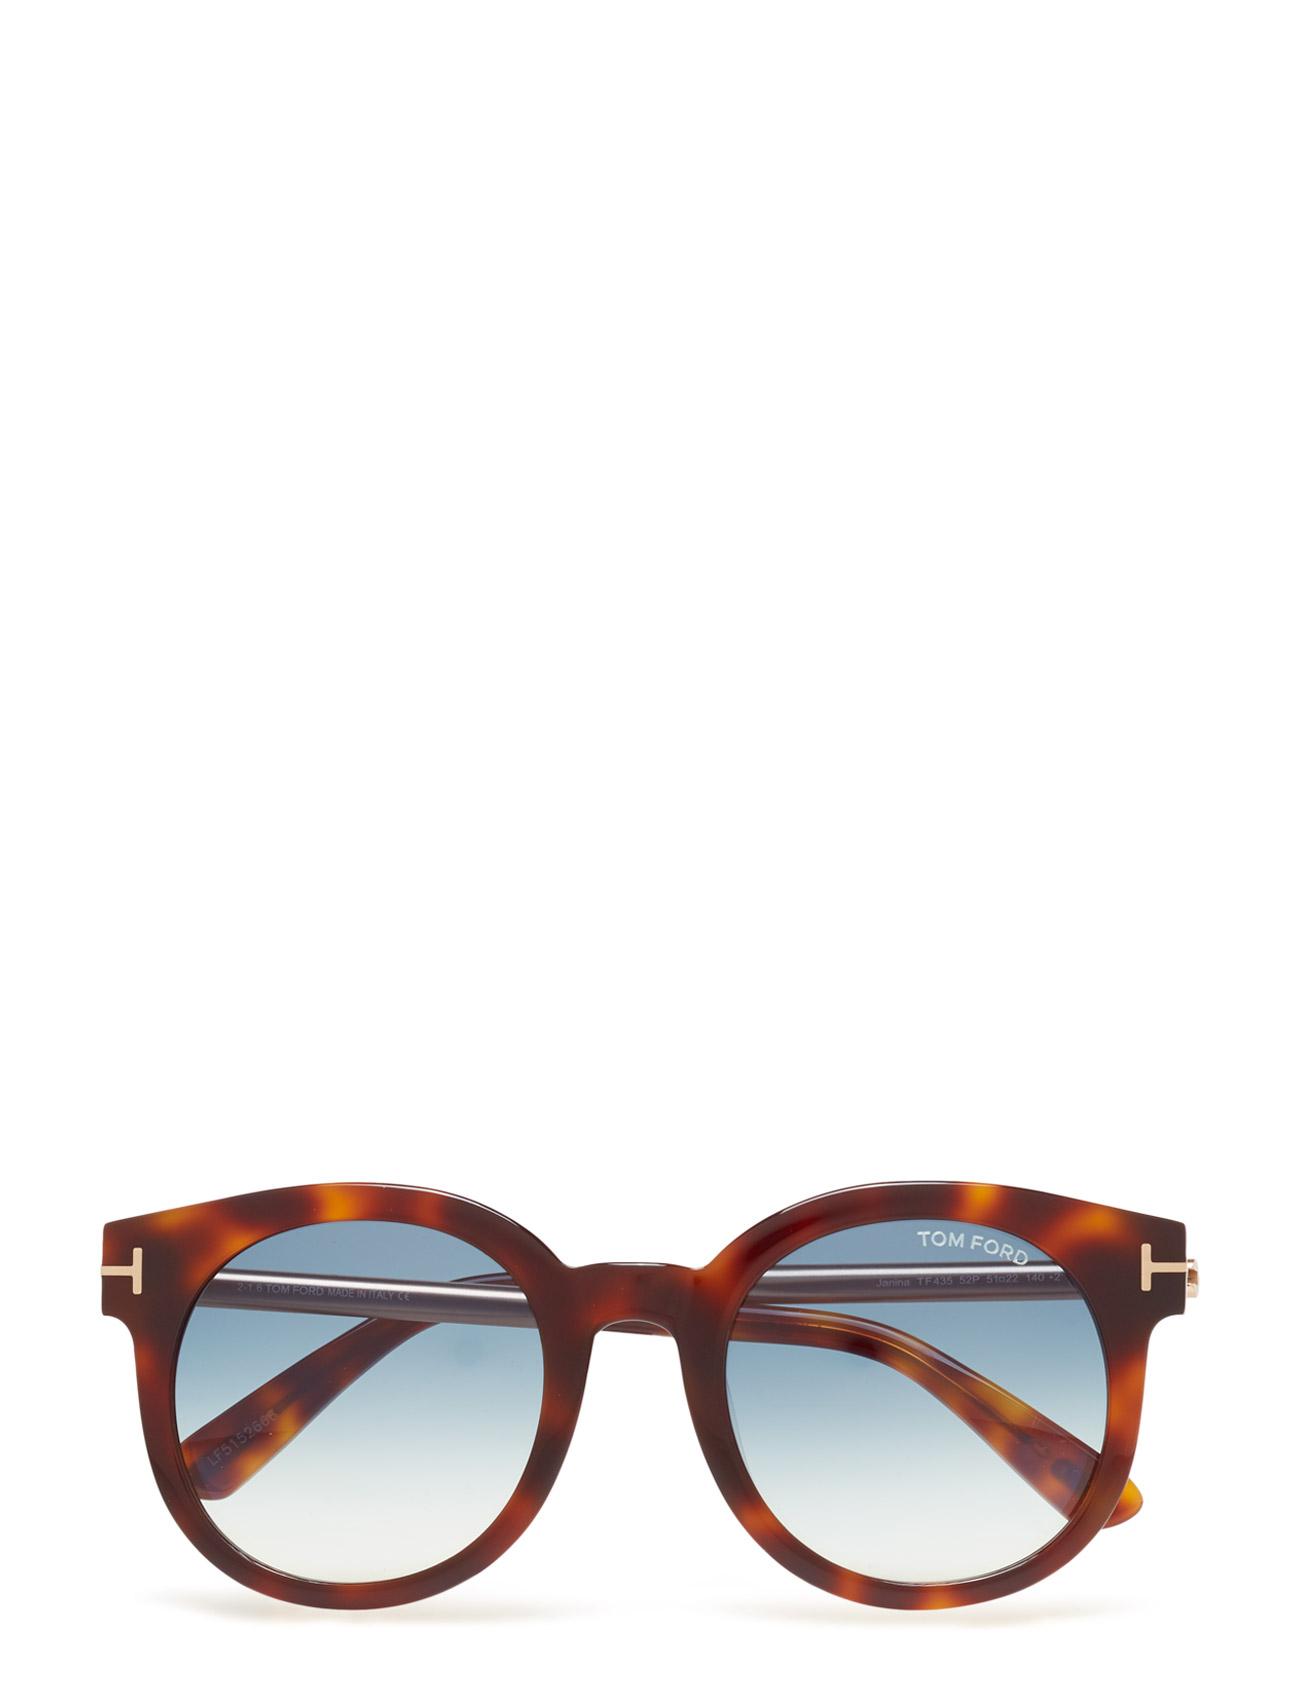 Tom Ford Janina Tom Ford Sunglasses Solbriller til Damer i